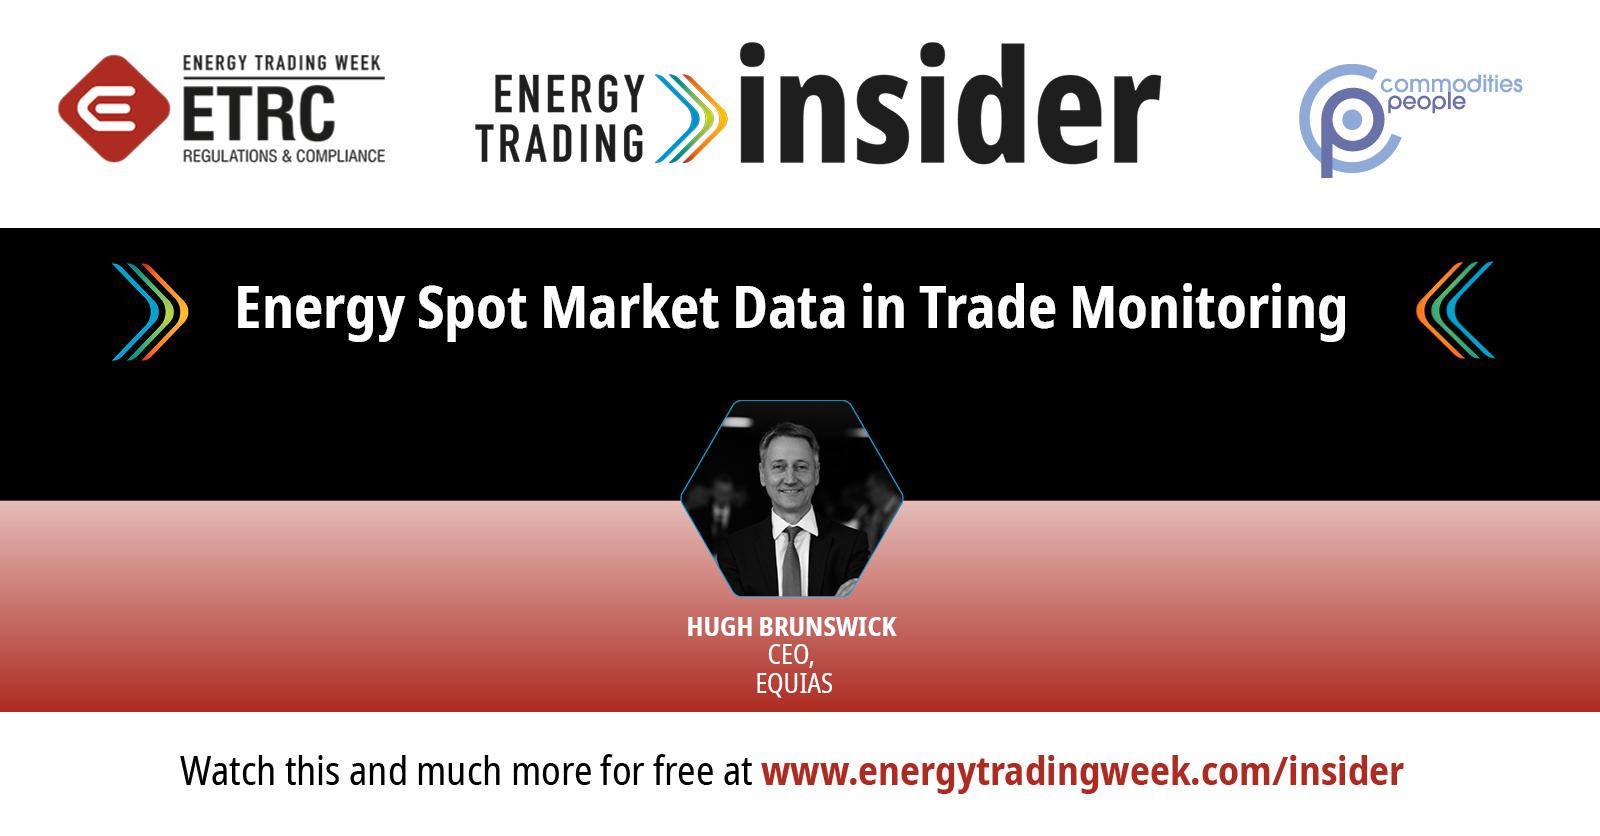 Energy Spot Market Data In Trade Monitoring